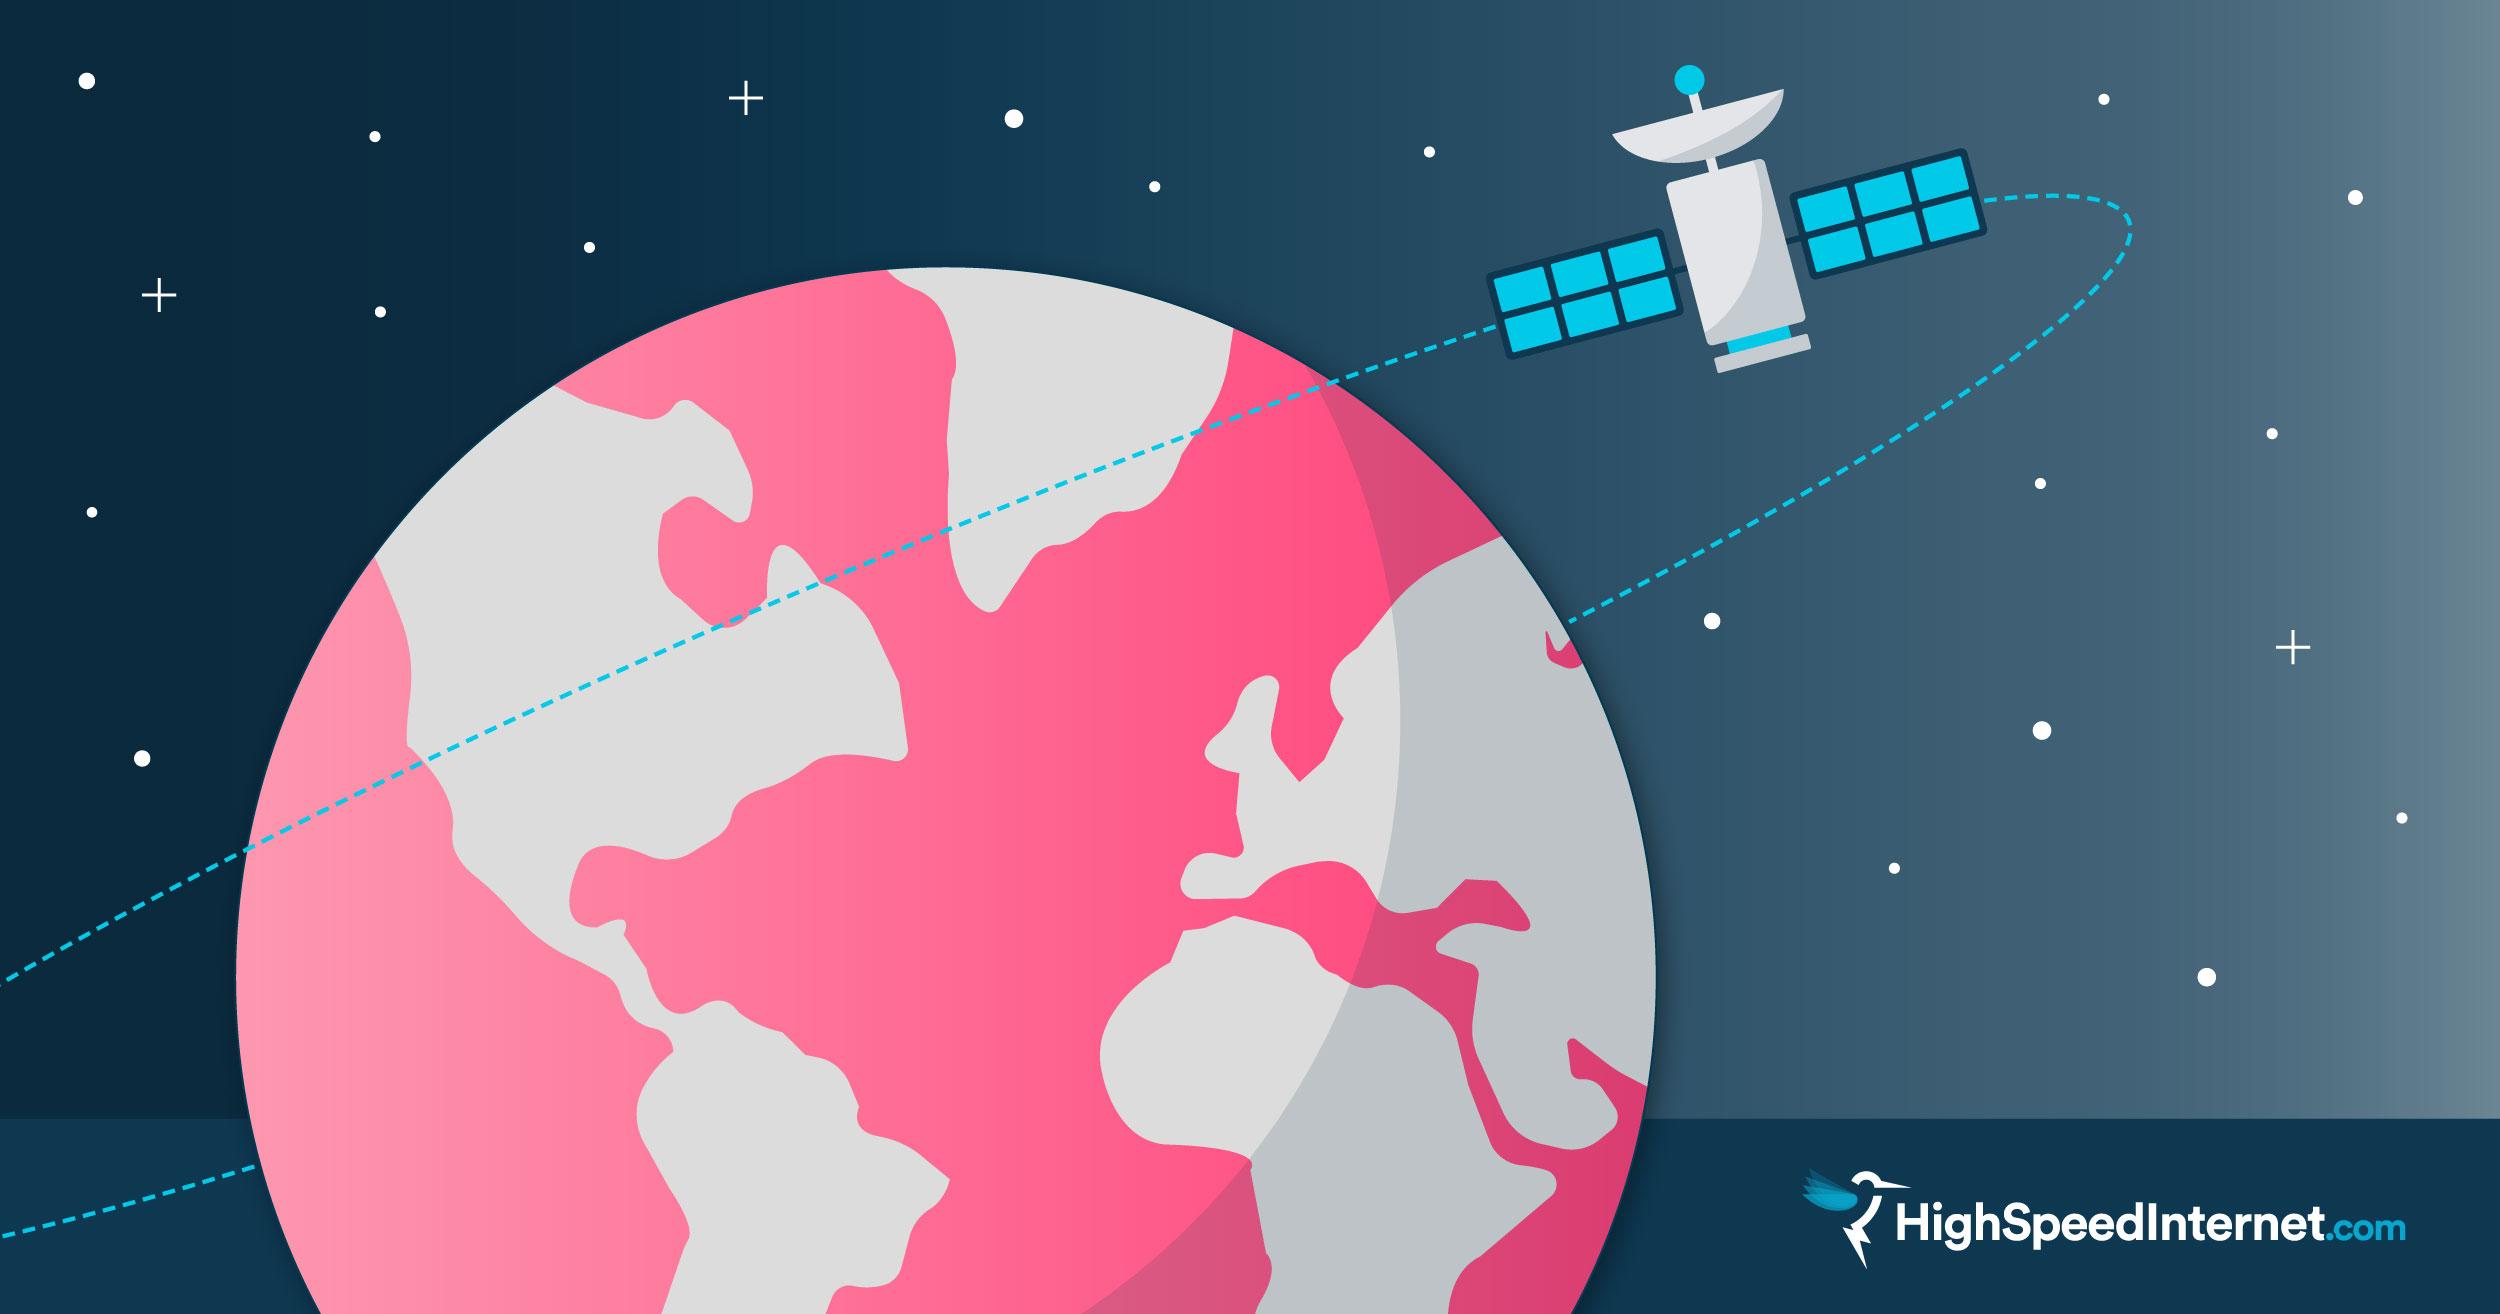 Image of a communication satellite in orbit